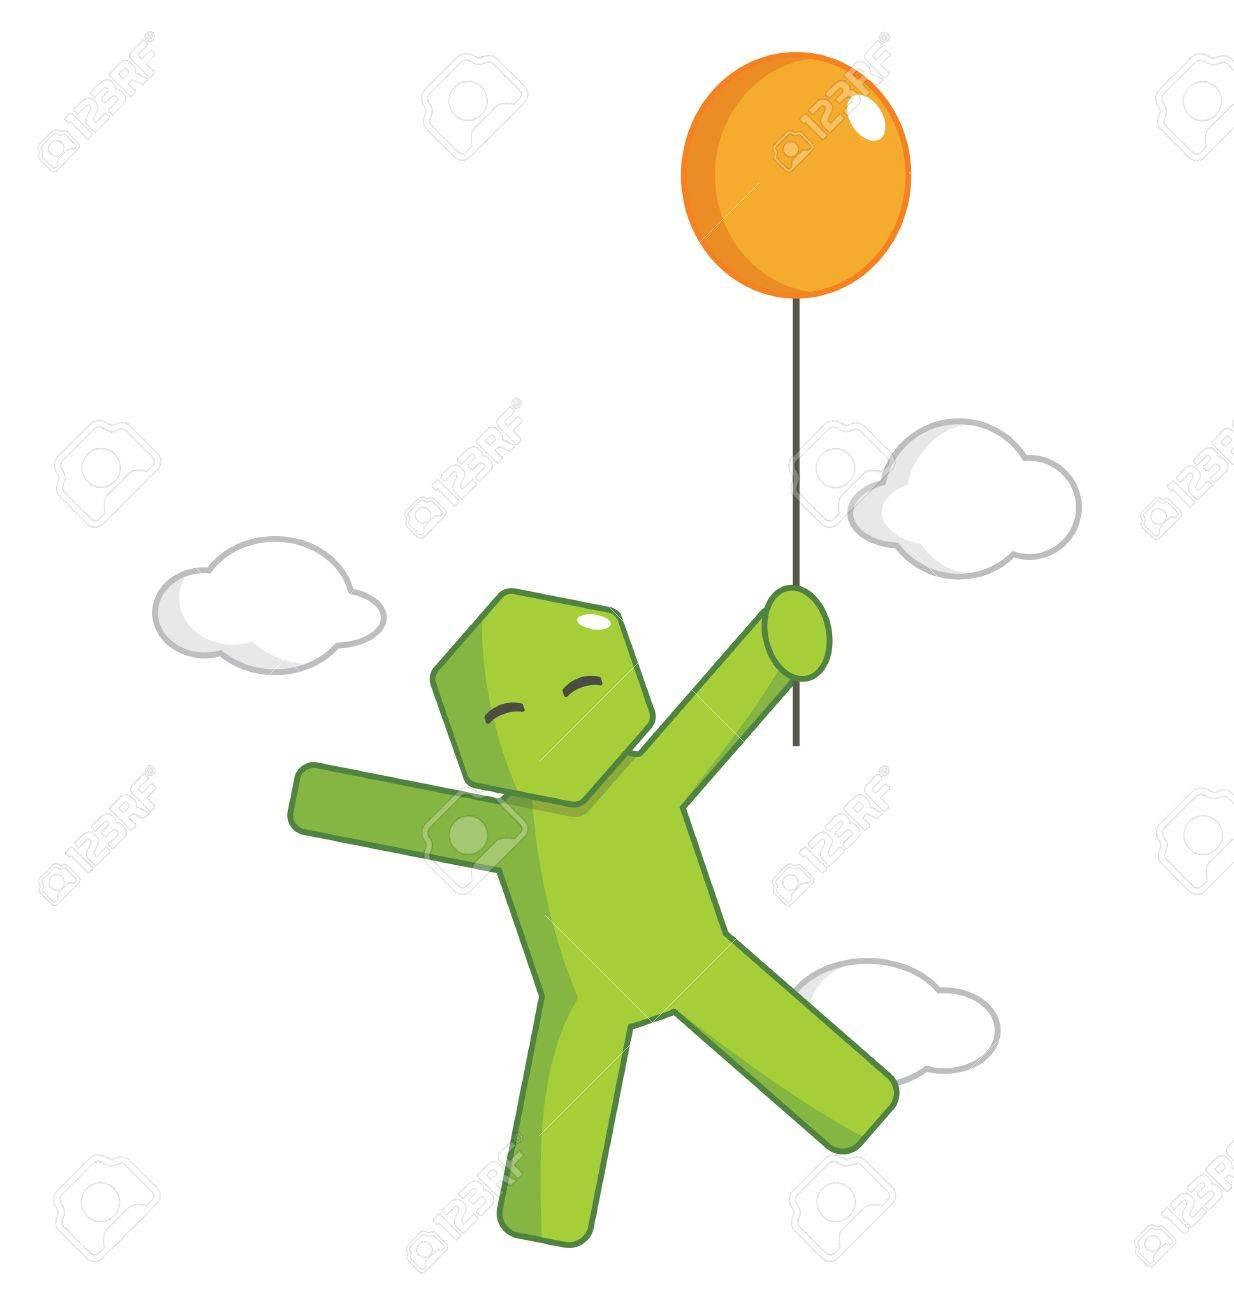 Hexagon Man - Flying By Balloon Stock Vector - 18530560